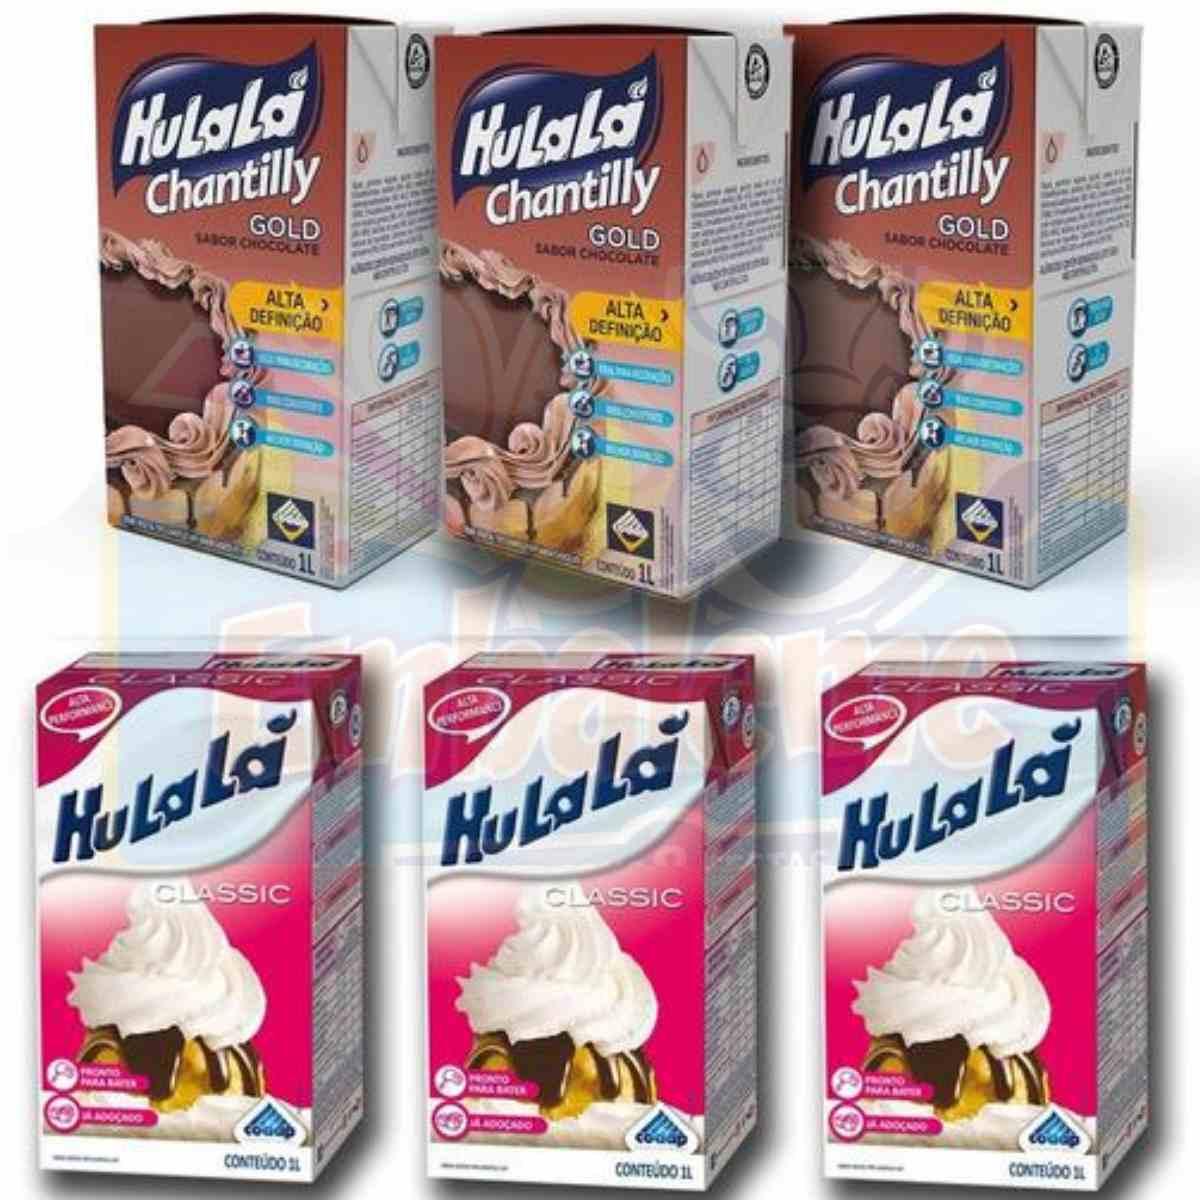 Kit 3 Chantilly Hulalá Clássico + 3 Chantilly Hulalá de Chocolate 1litro